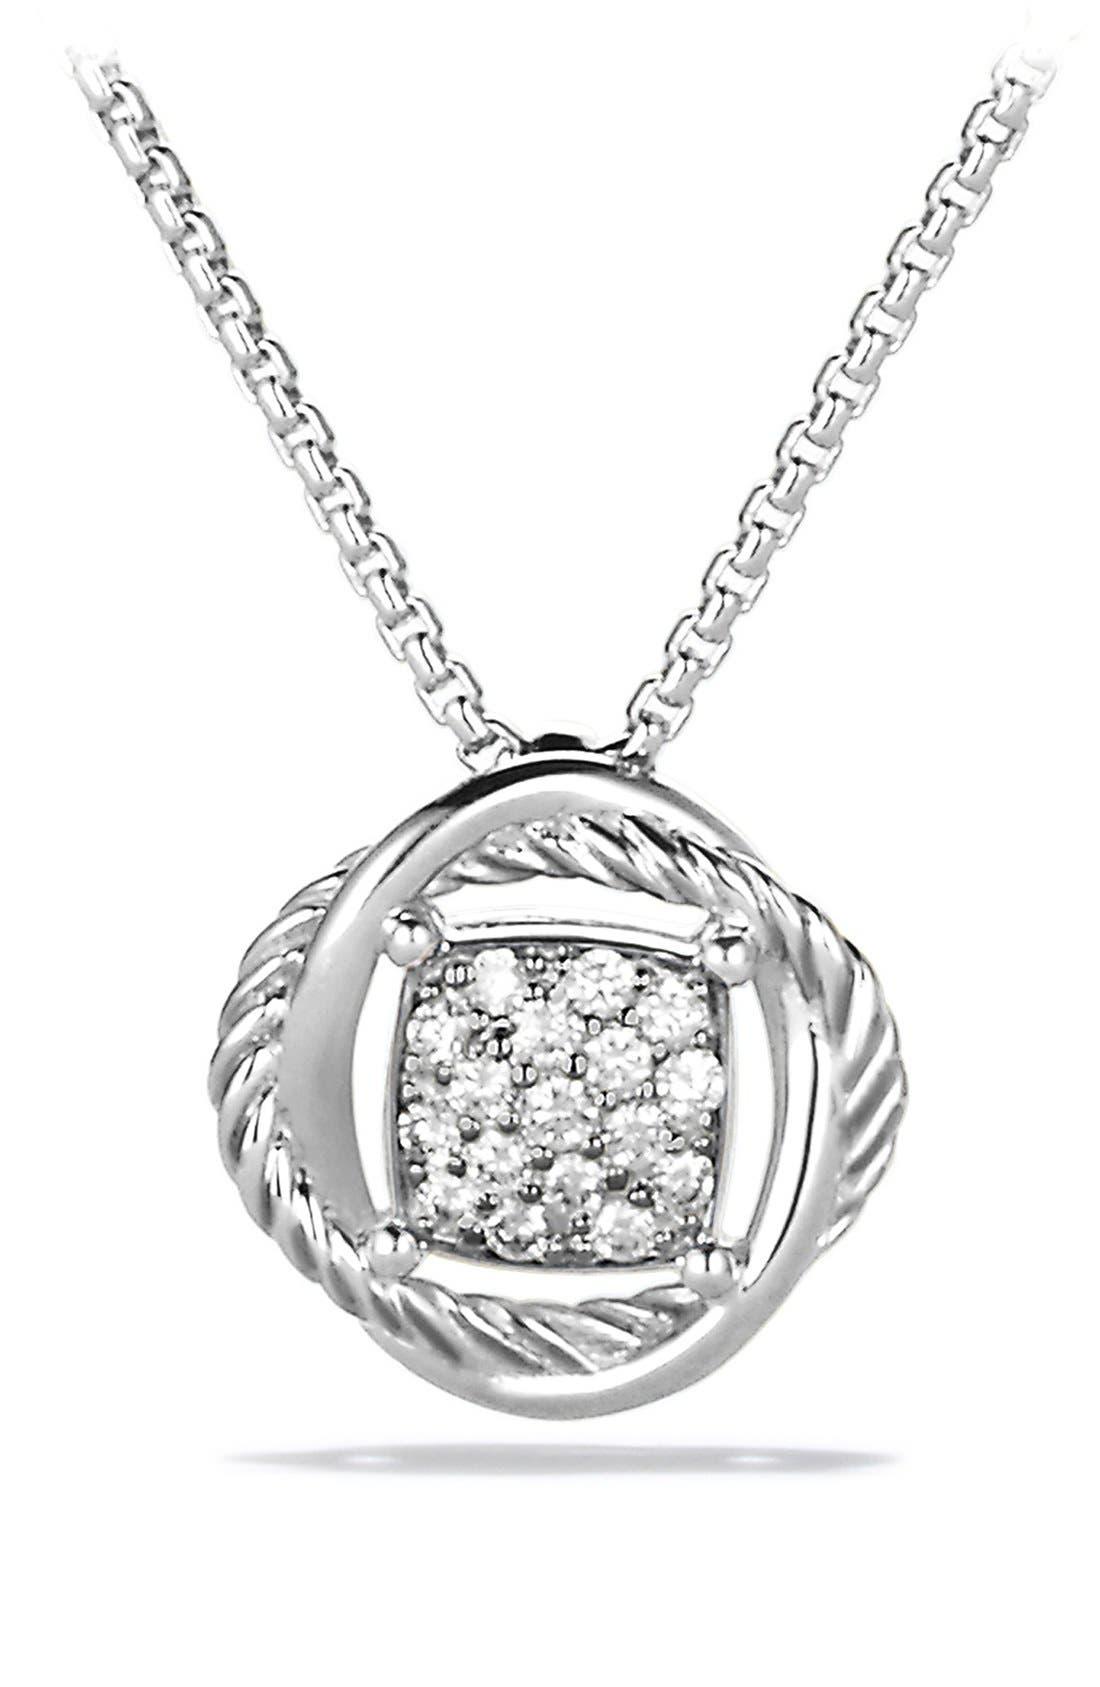 Main Image - David Yurman 'Infinity' Pendant with Diamonds on Chain